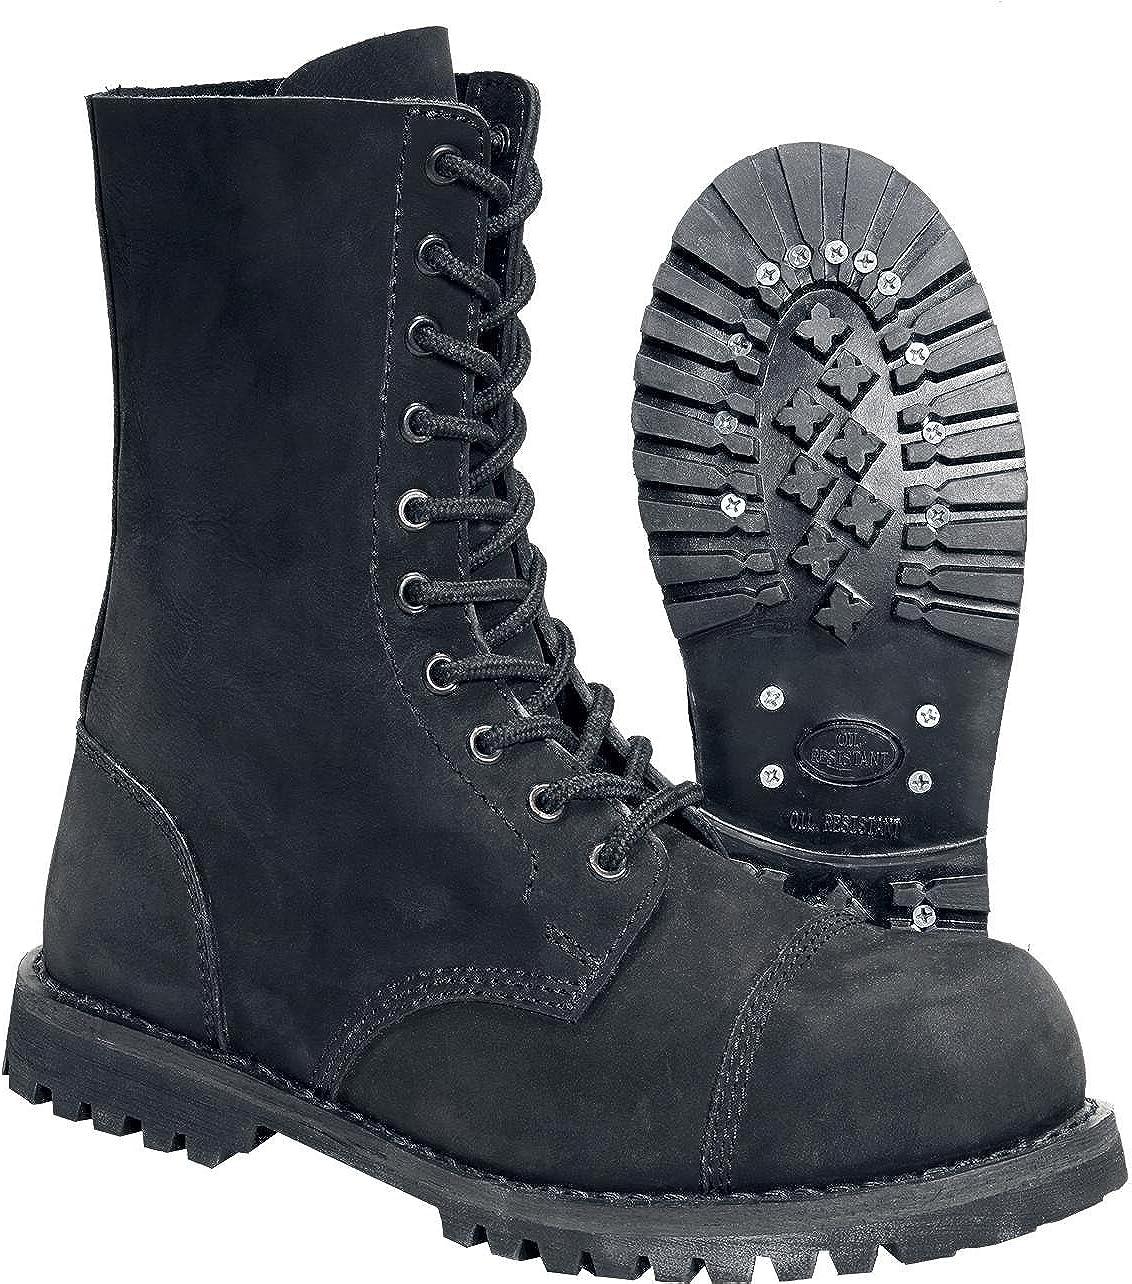 Brandit Phantom Daim Bottes en Cuir Nubuck Leather Boots